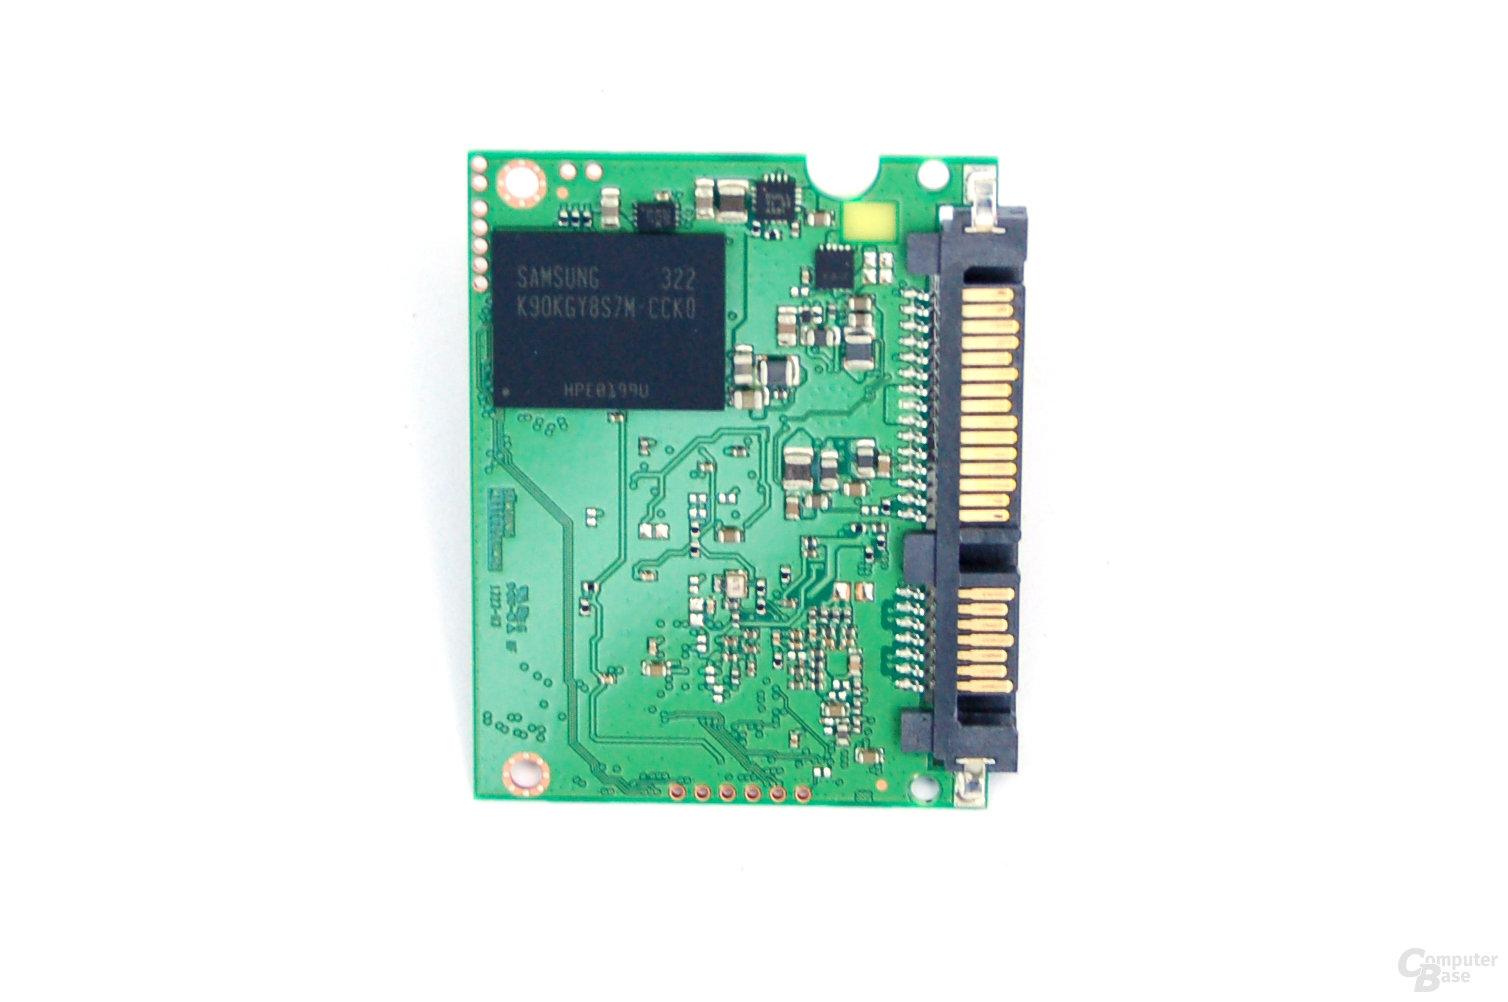 Samsung SSD 840 Evo 250 GB